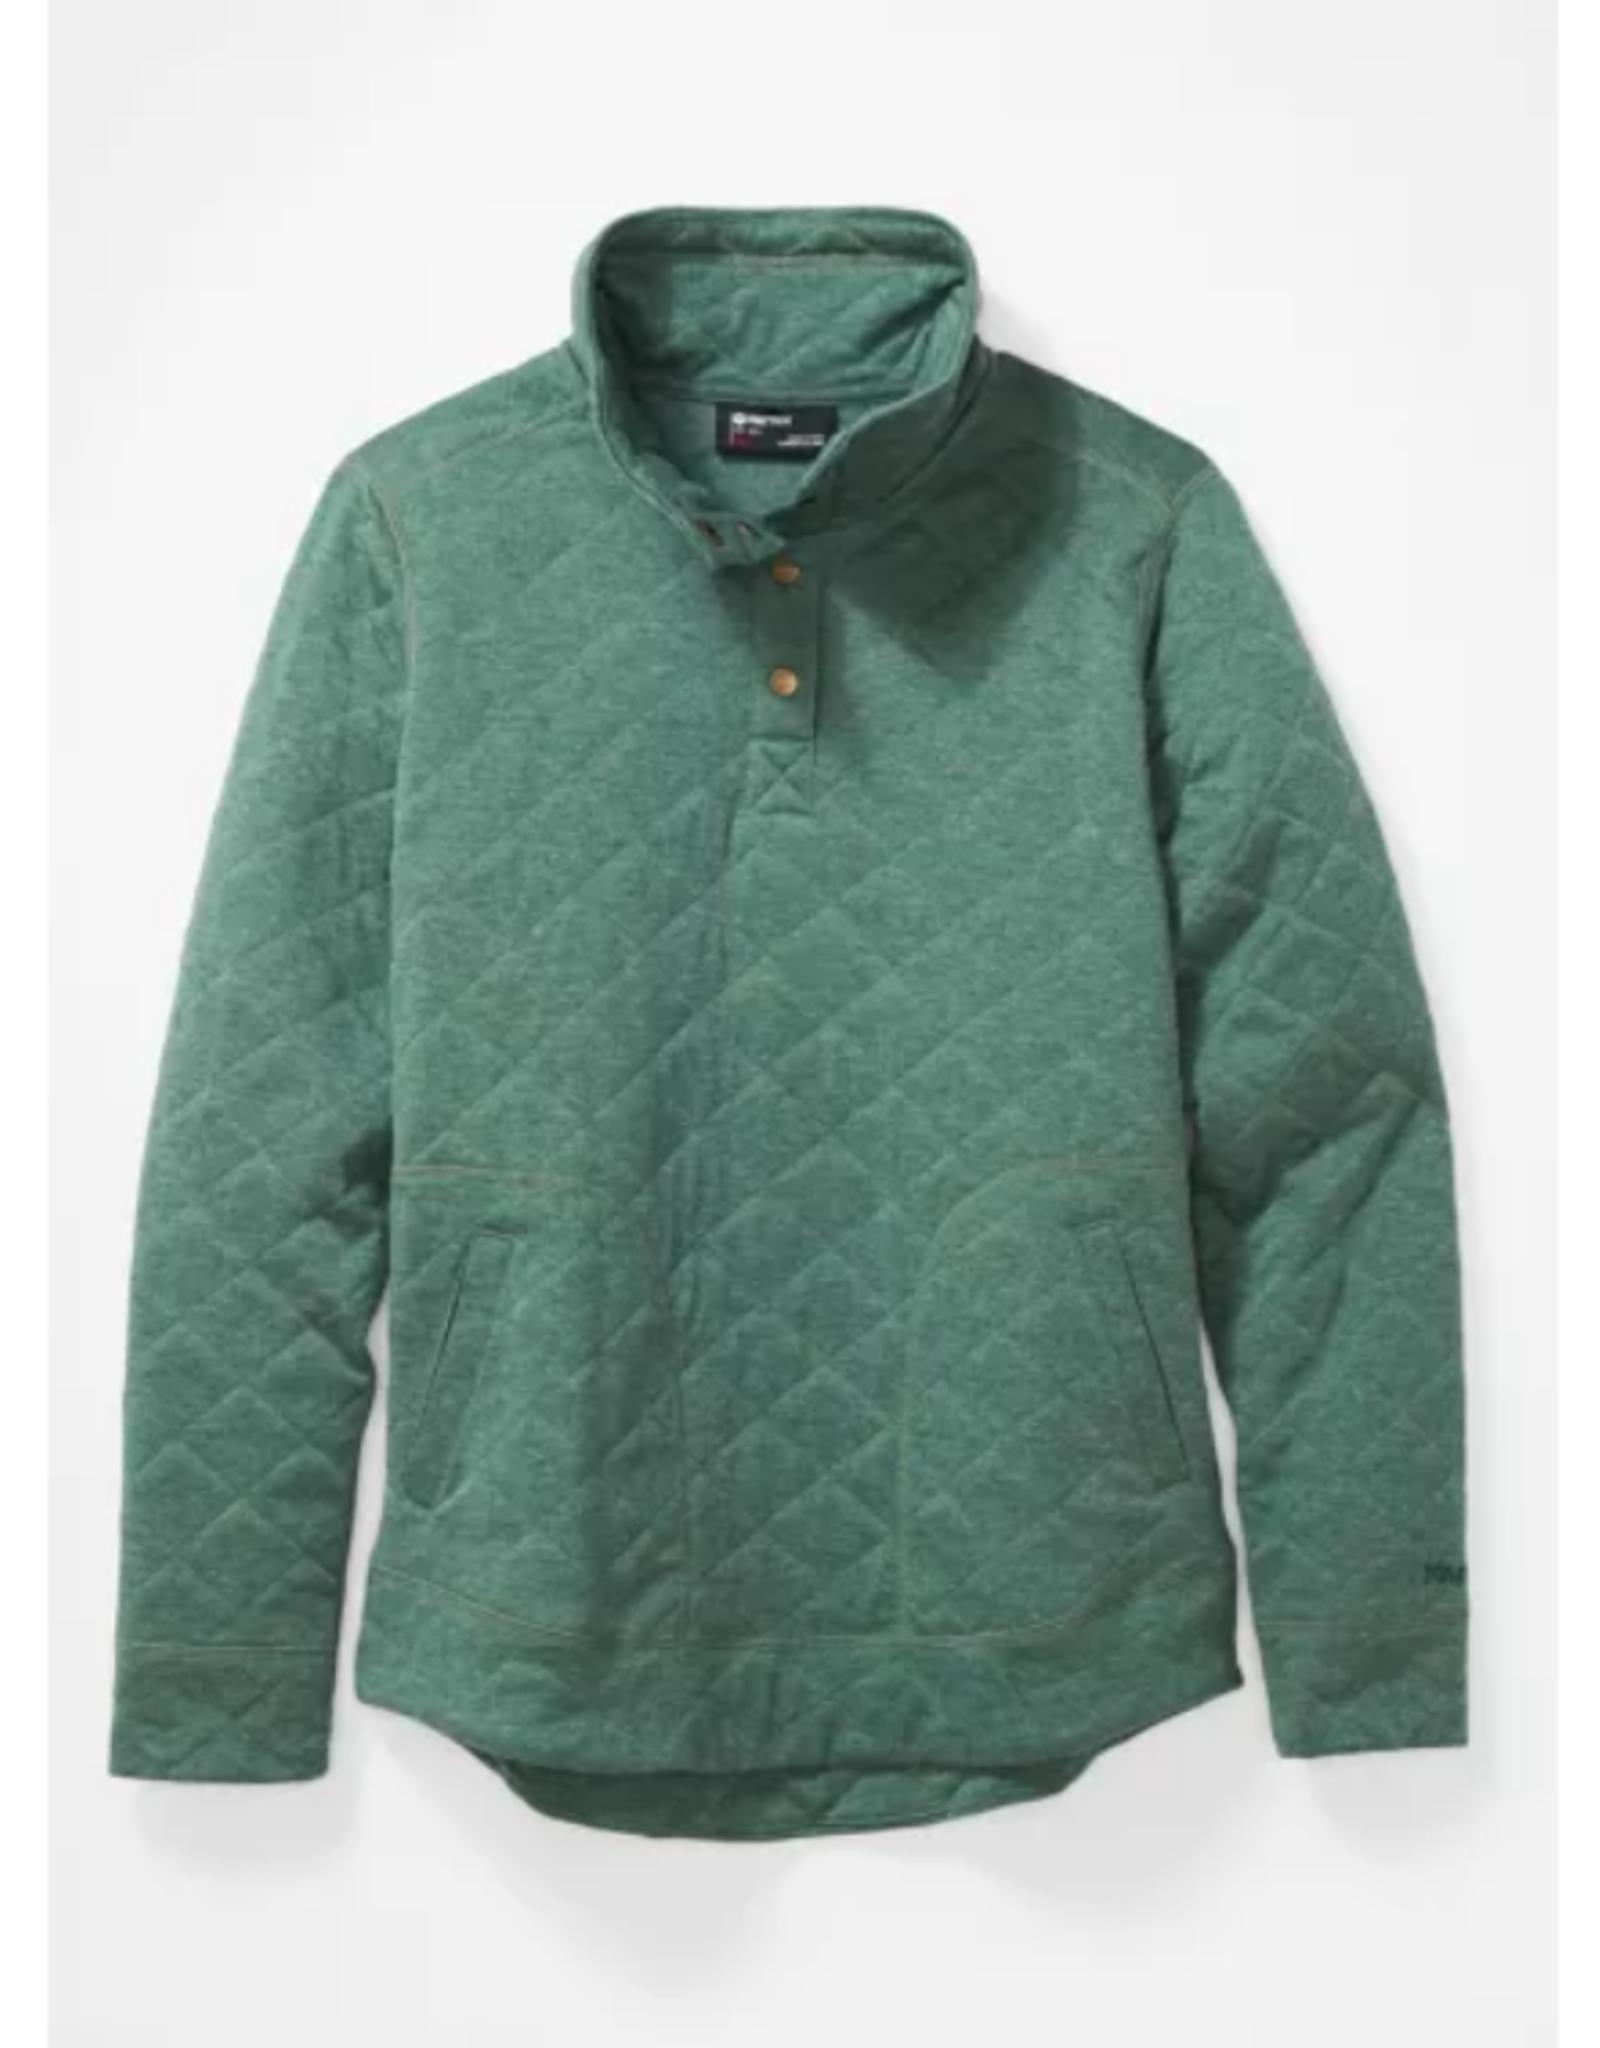 MARMOT Marmot Wm's Roice  Pullover LS